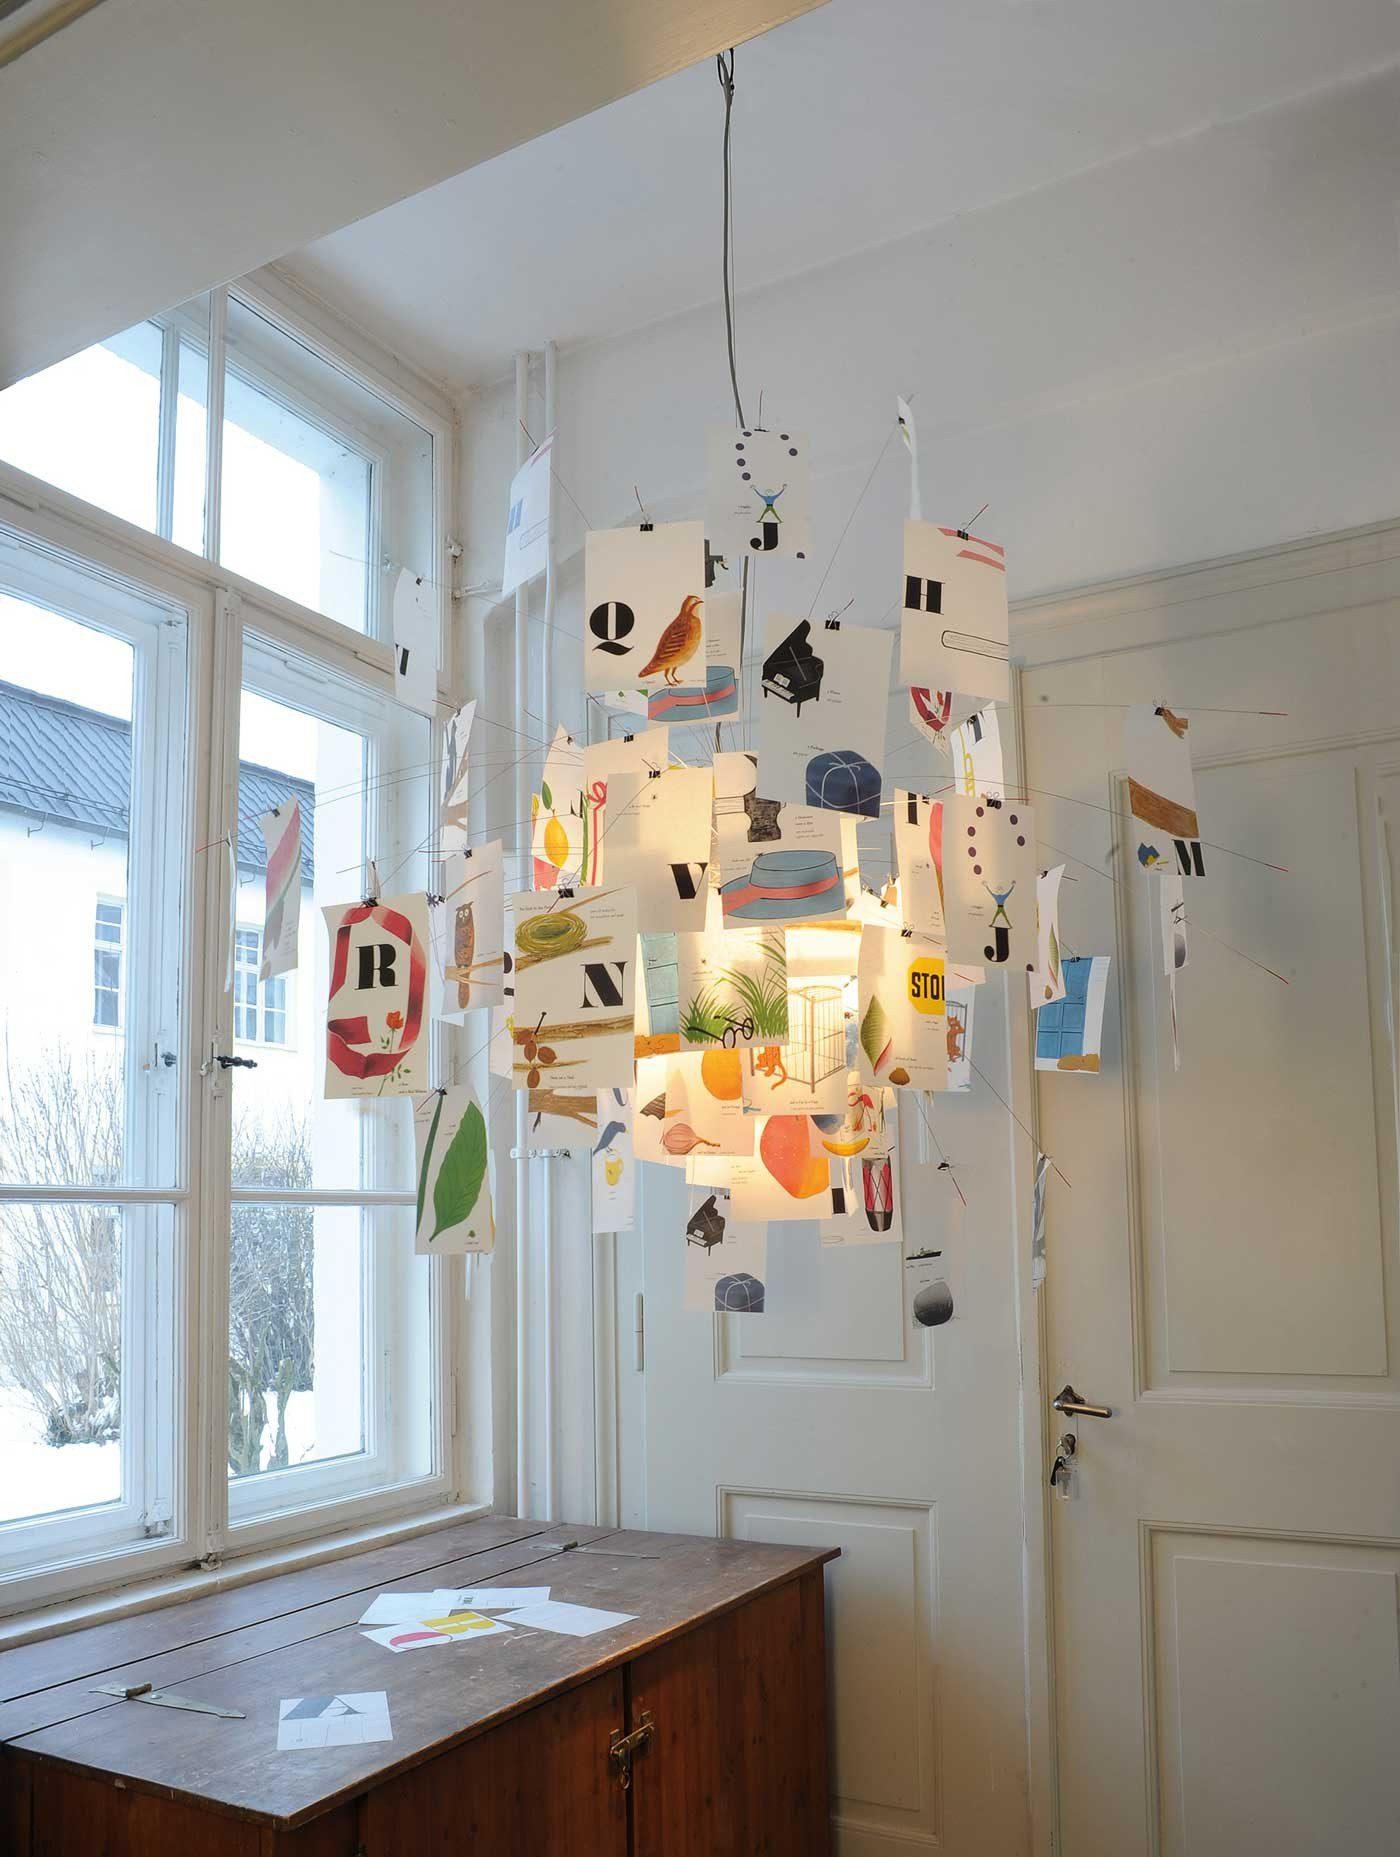 Zettel'z Ingo Maurer illuminazione a sospensione icona design